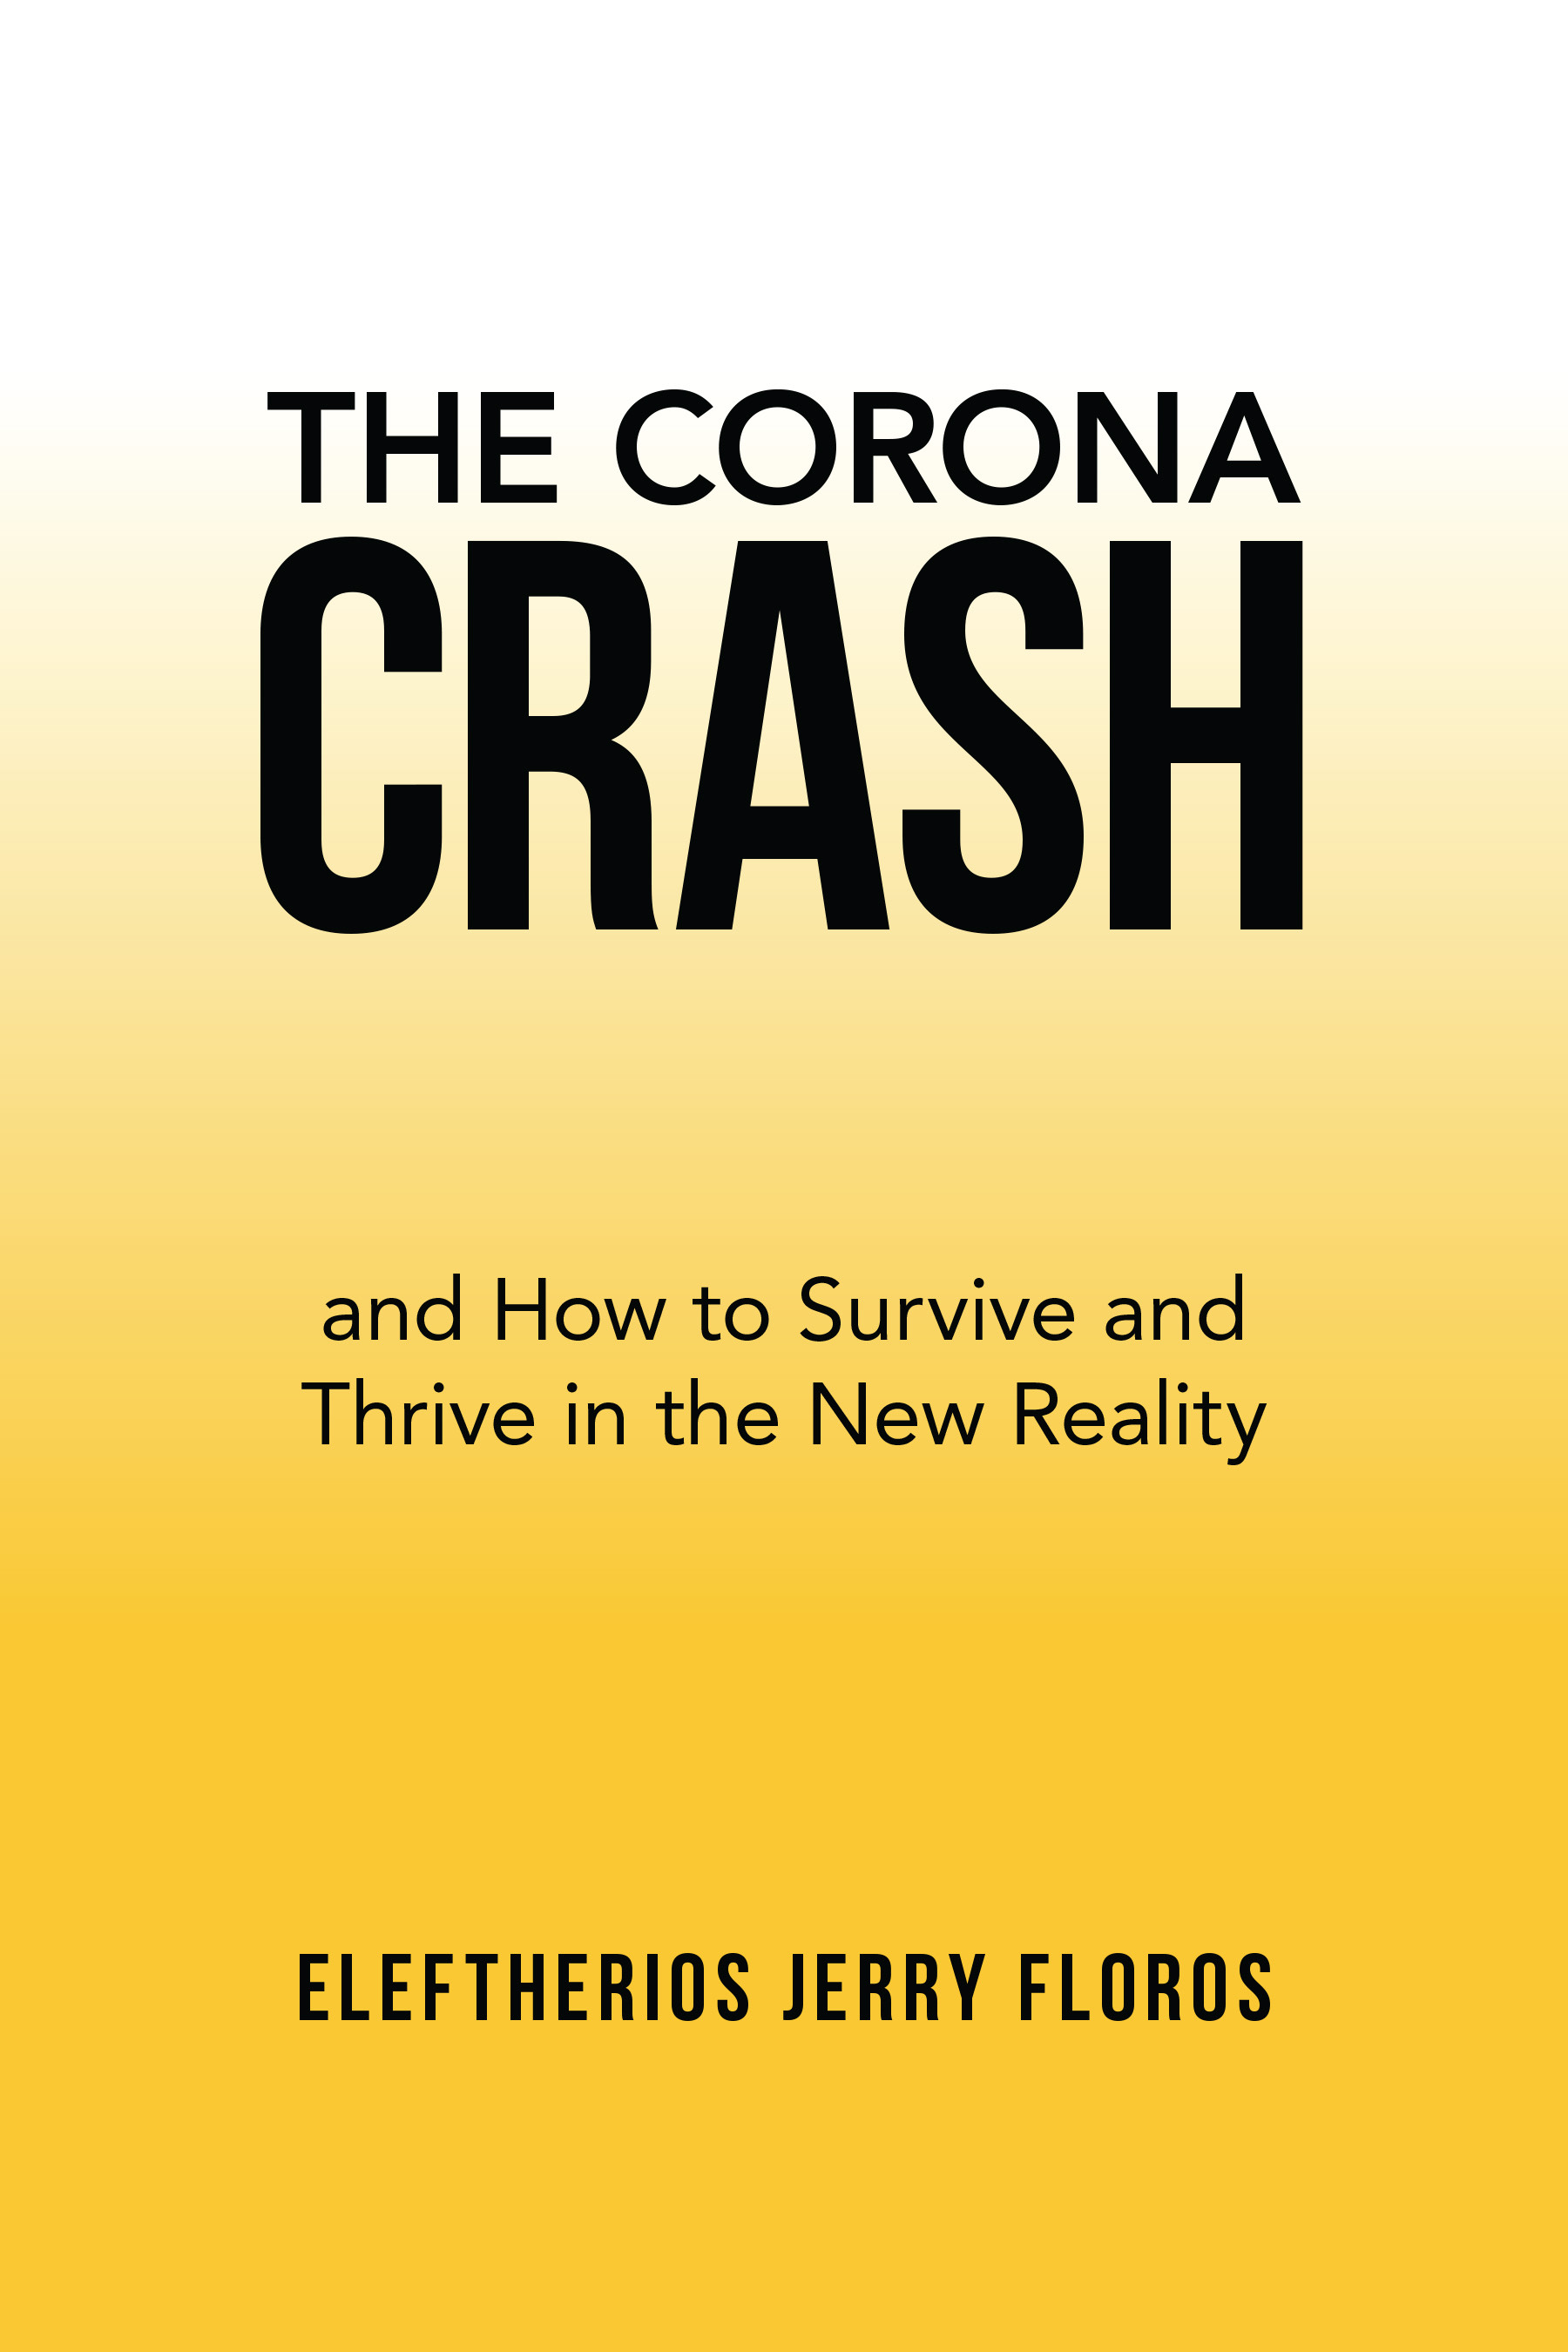 The_Corona_Crash.jpg